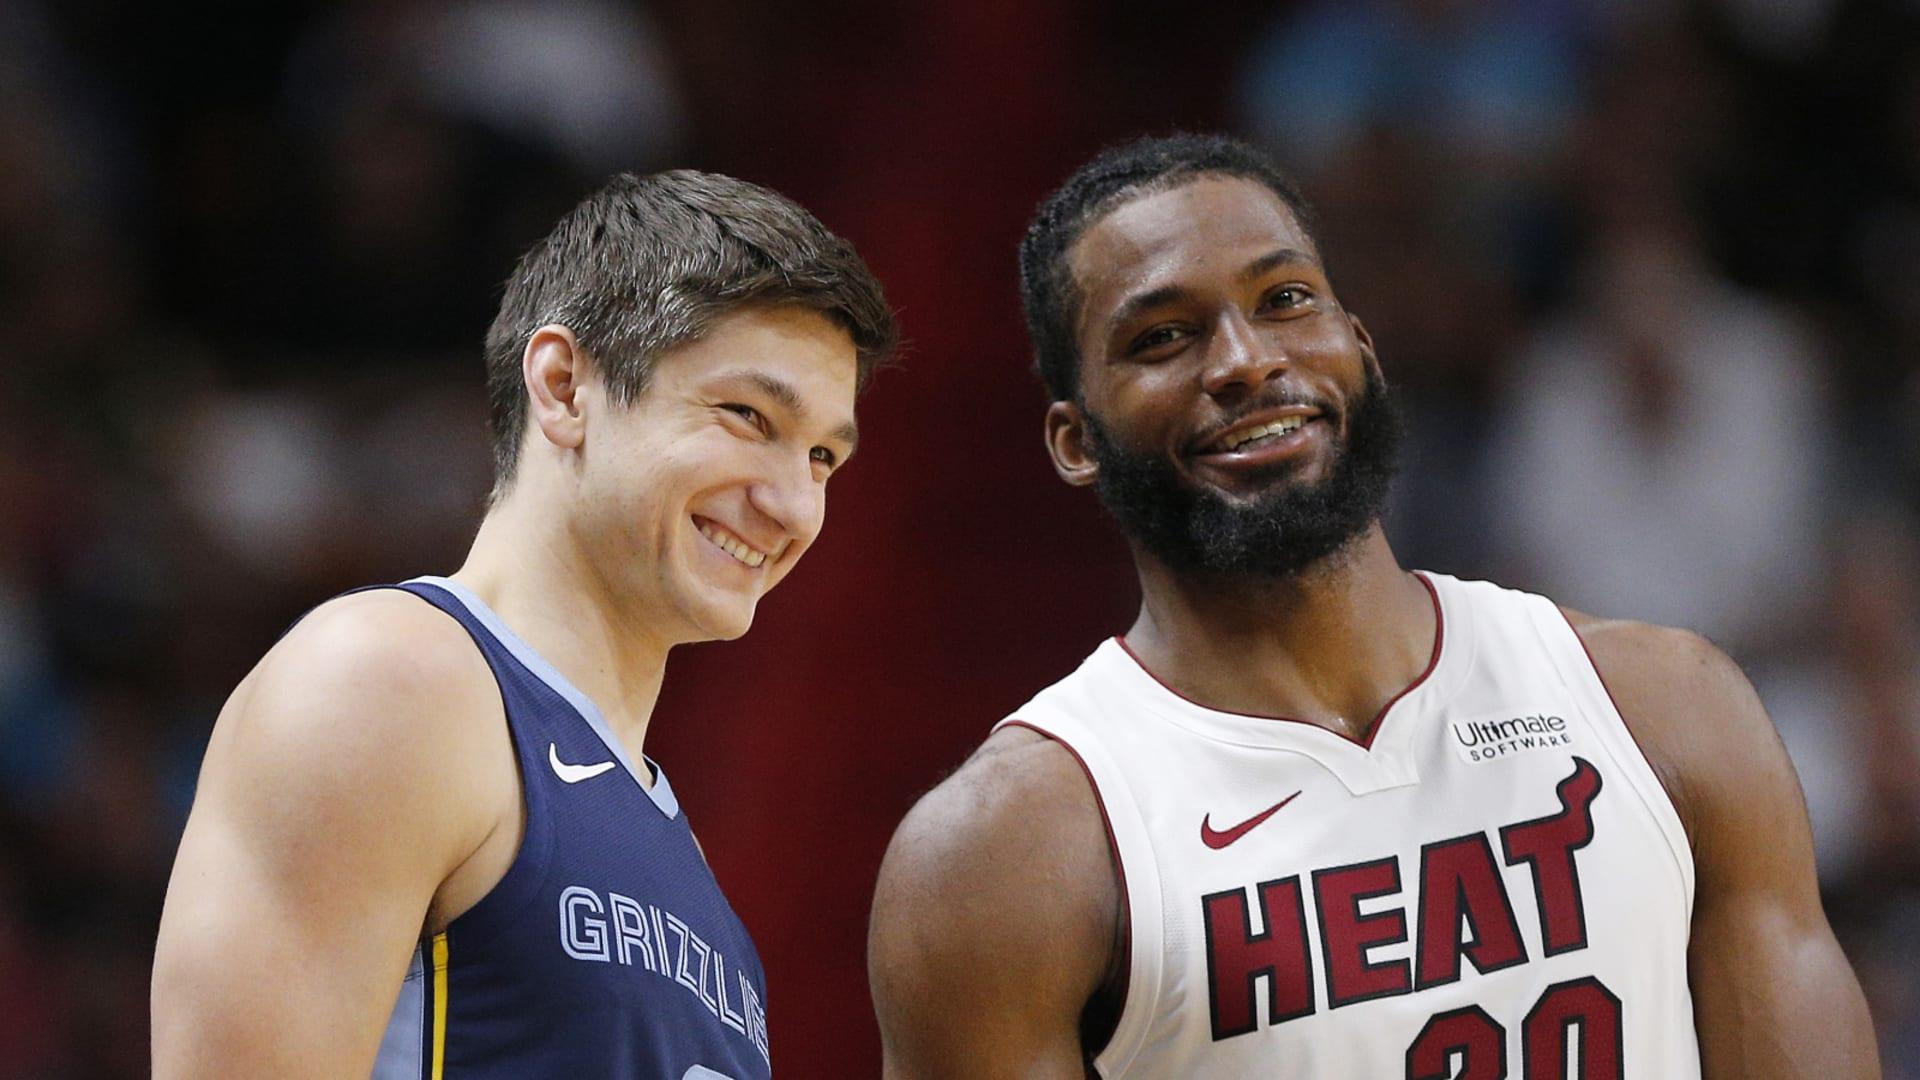 Duke basketball: Grayson Allen, Justise Winslow show positive signs